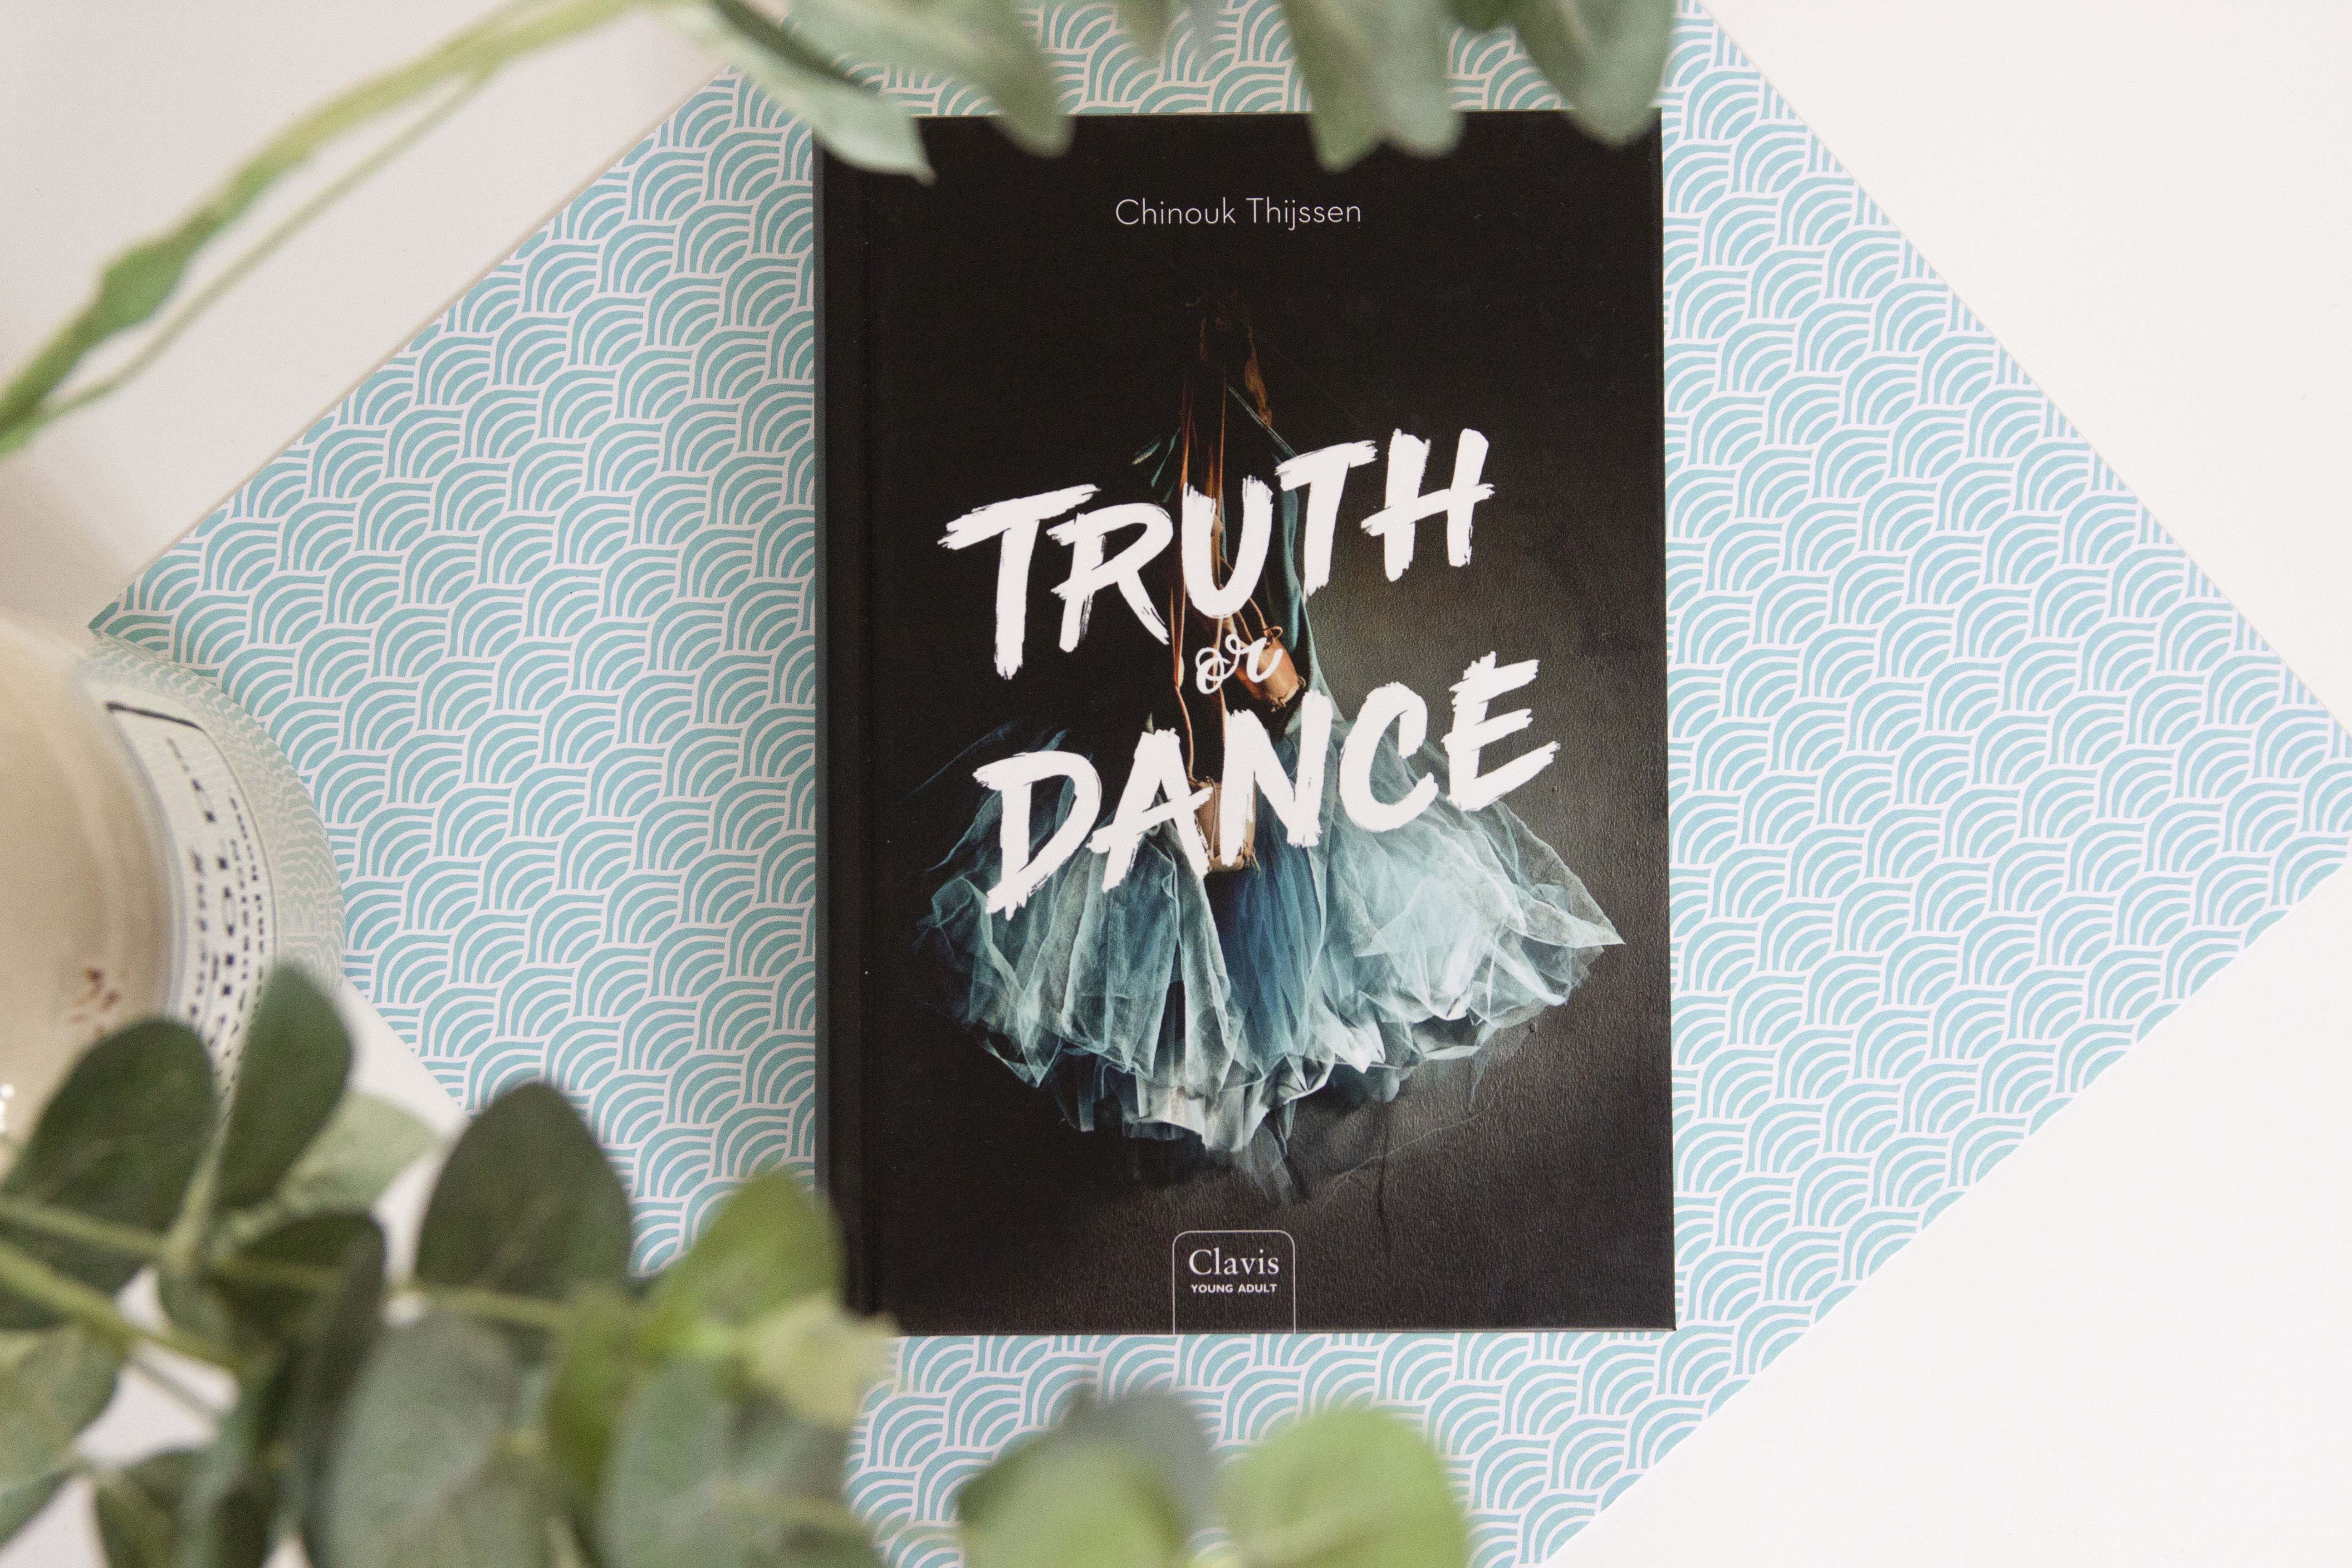 recensie, truth or dance, chinook thijssen